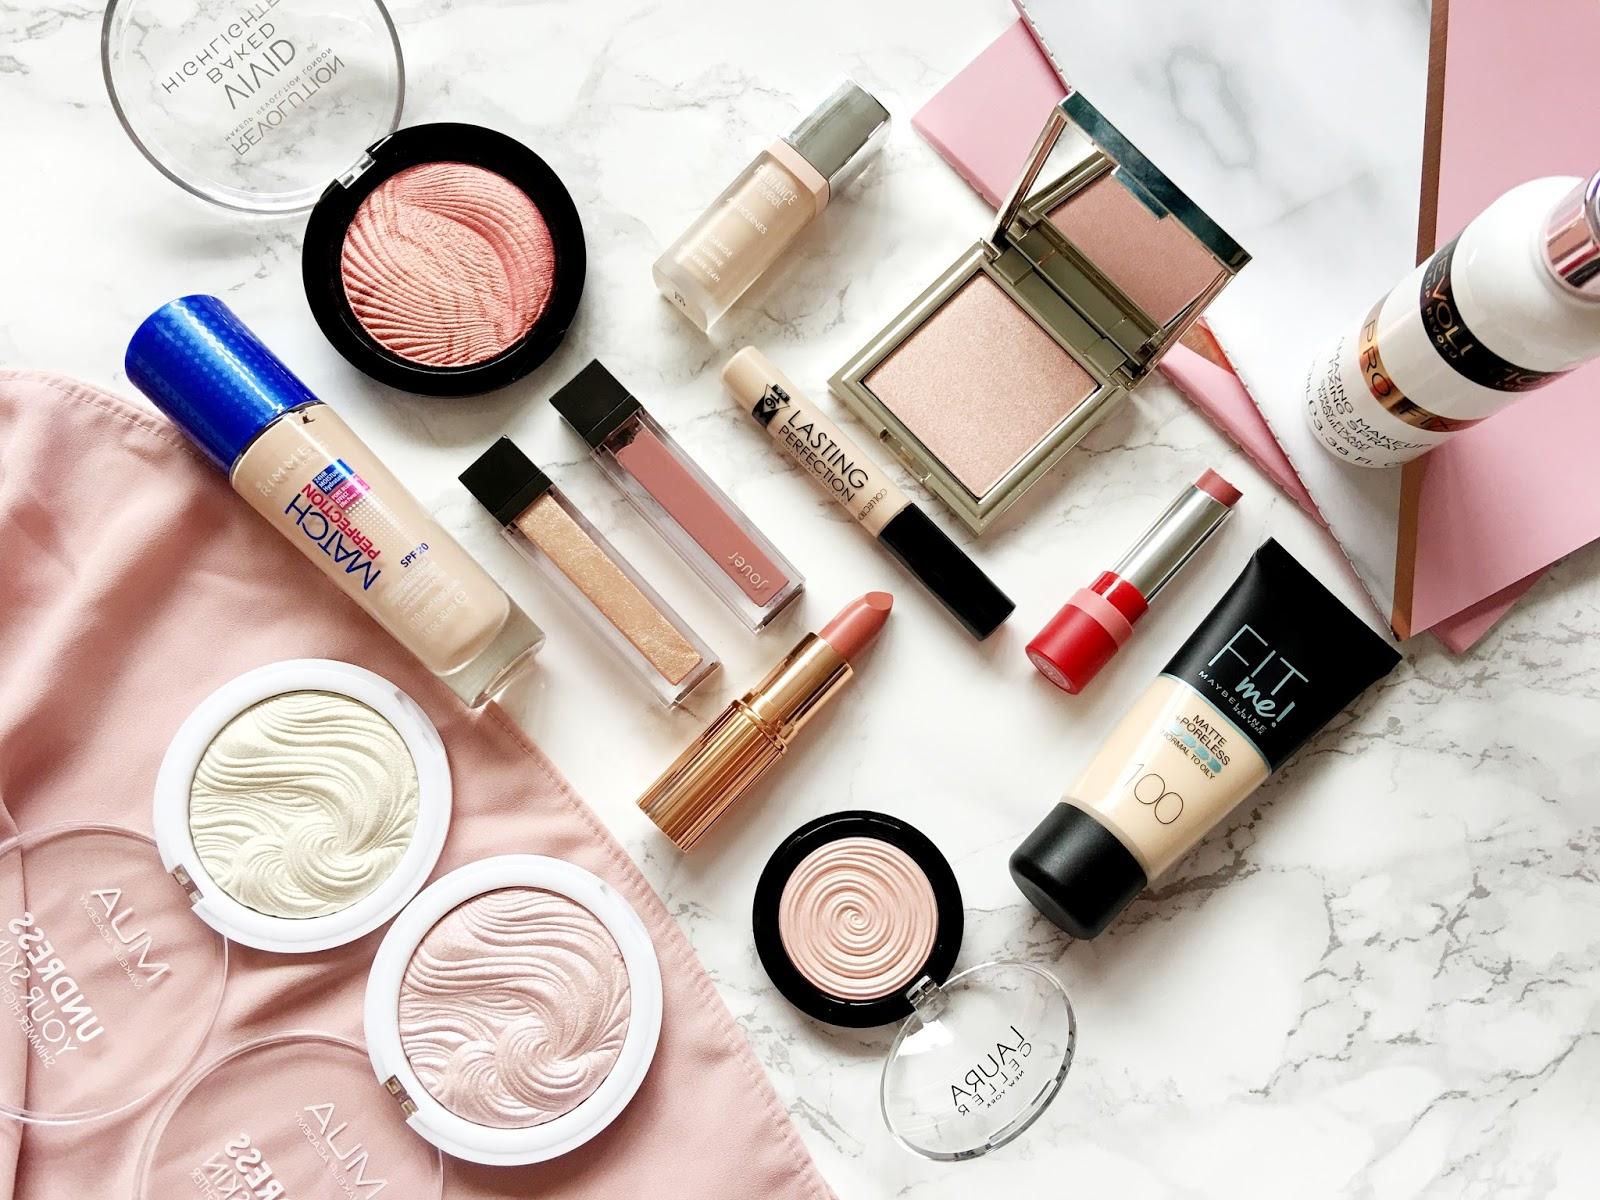 A Collective Makeup Haul